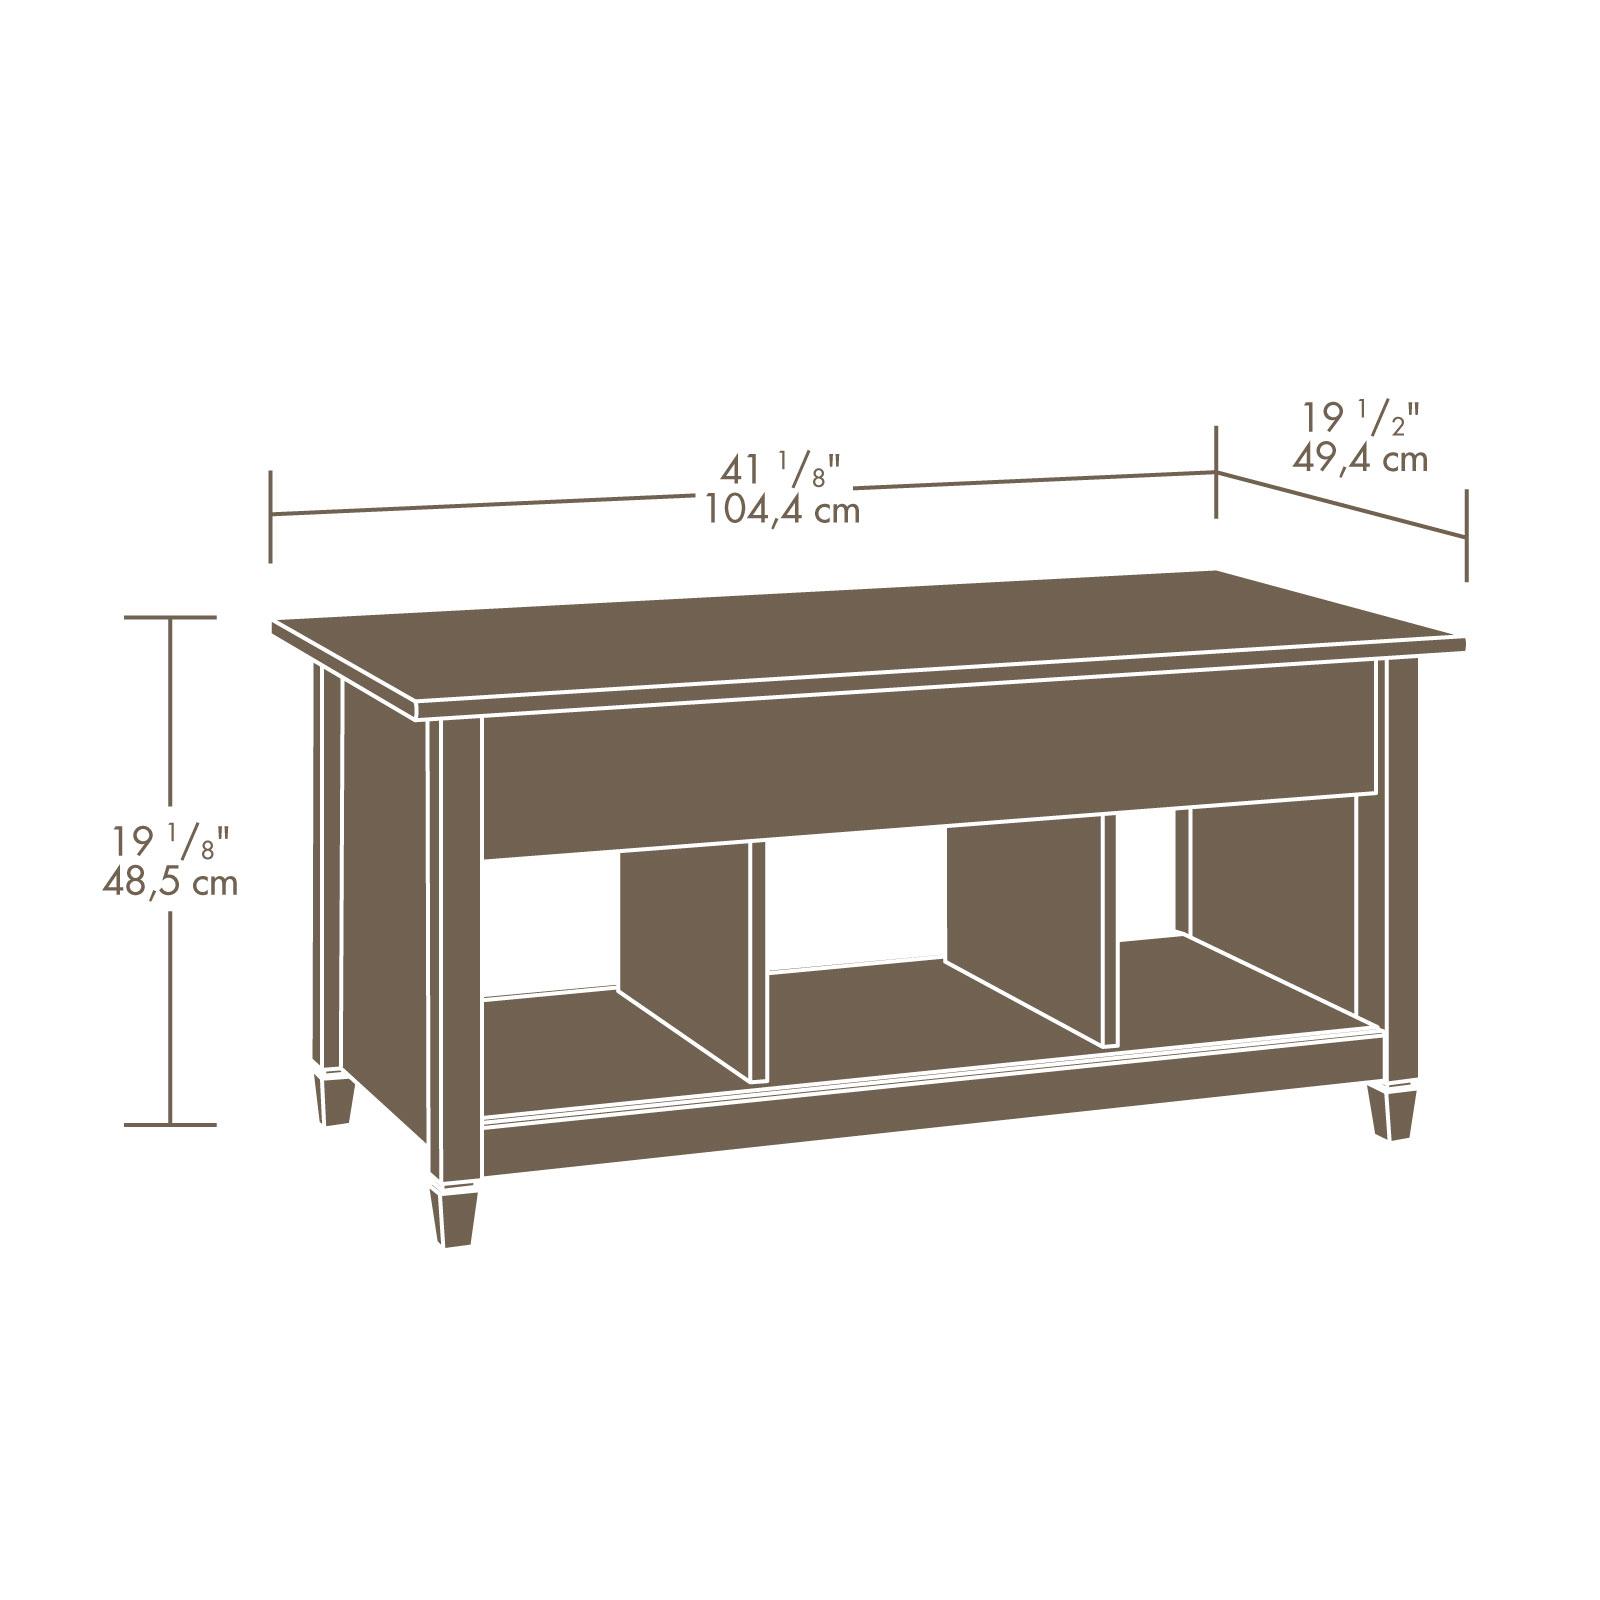 Sauder Edge Water Lift Top Coffee Table Estate Black Finish.Sauder Edge Water Lift Top Coffee Table 414856 Sauder The